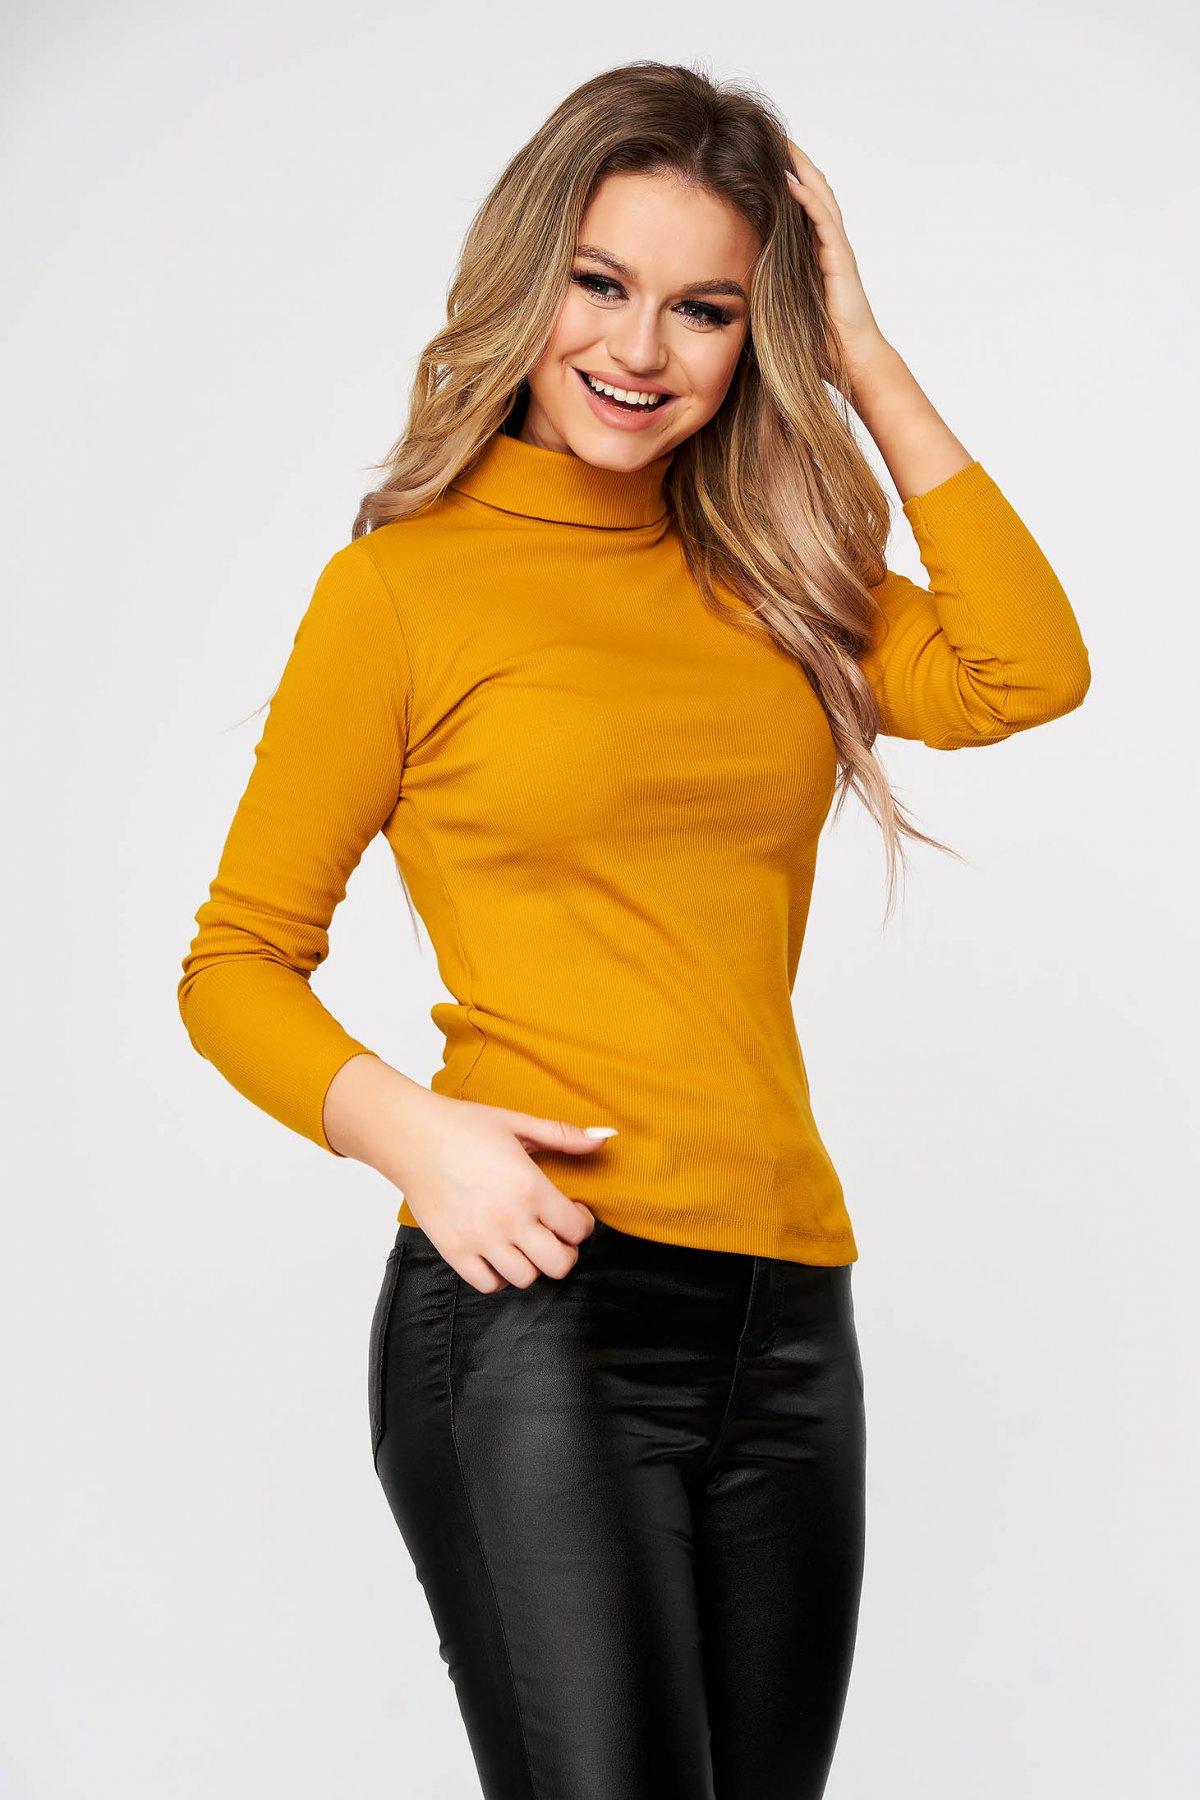 Bluza Dama Sunshine Mustariu Casual Din Bumbac Reiat Usor Elastic Mulata Pe Gat